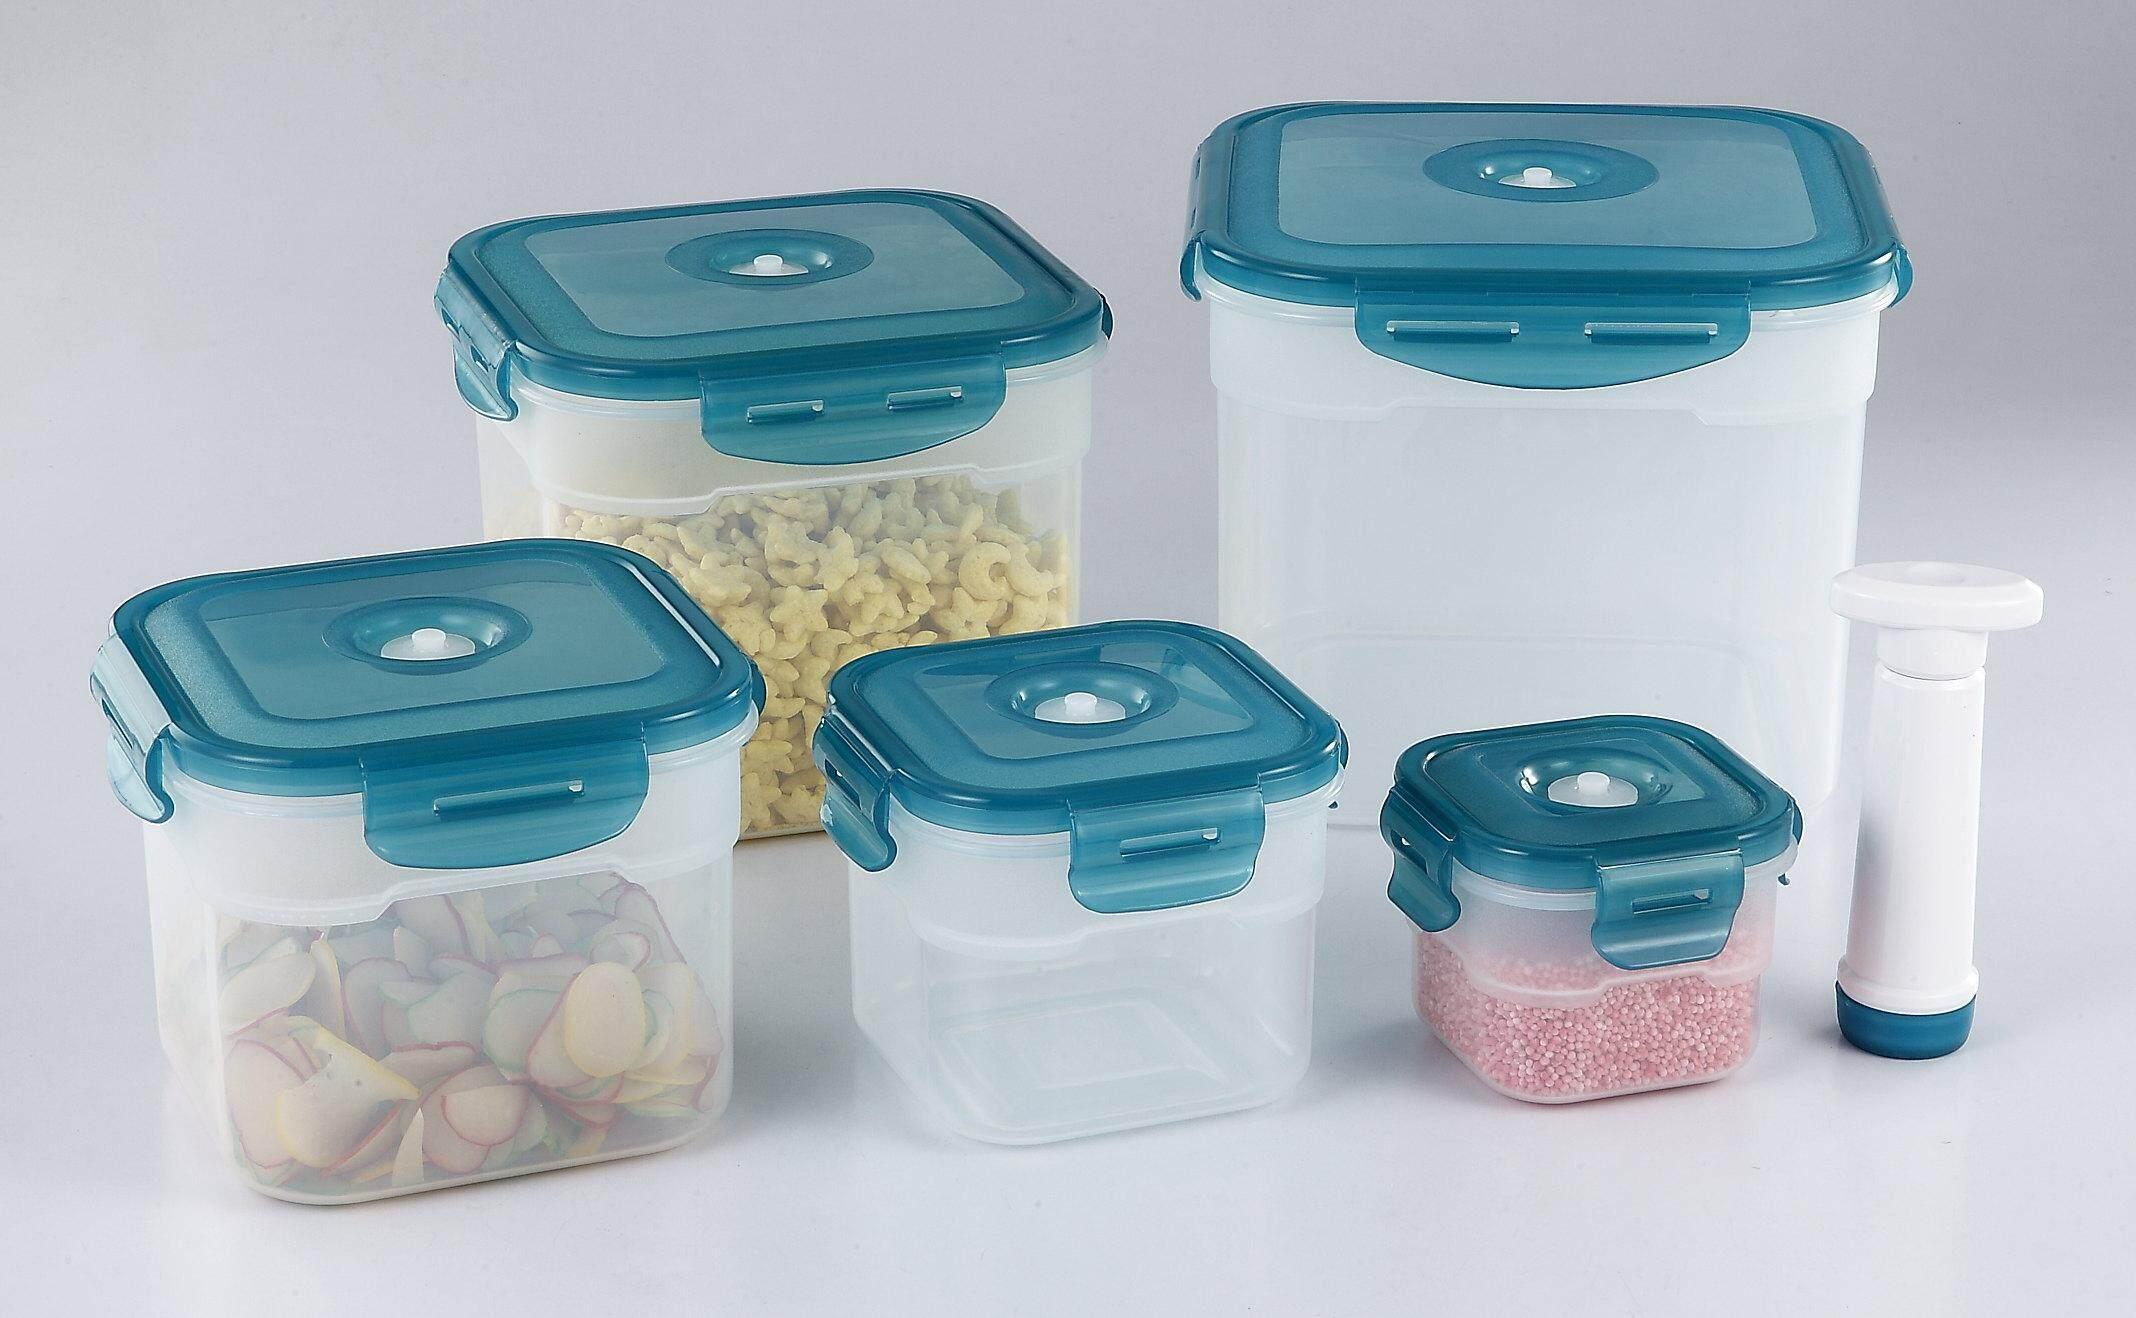 CLOC Finest Food Storage